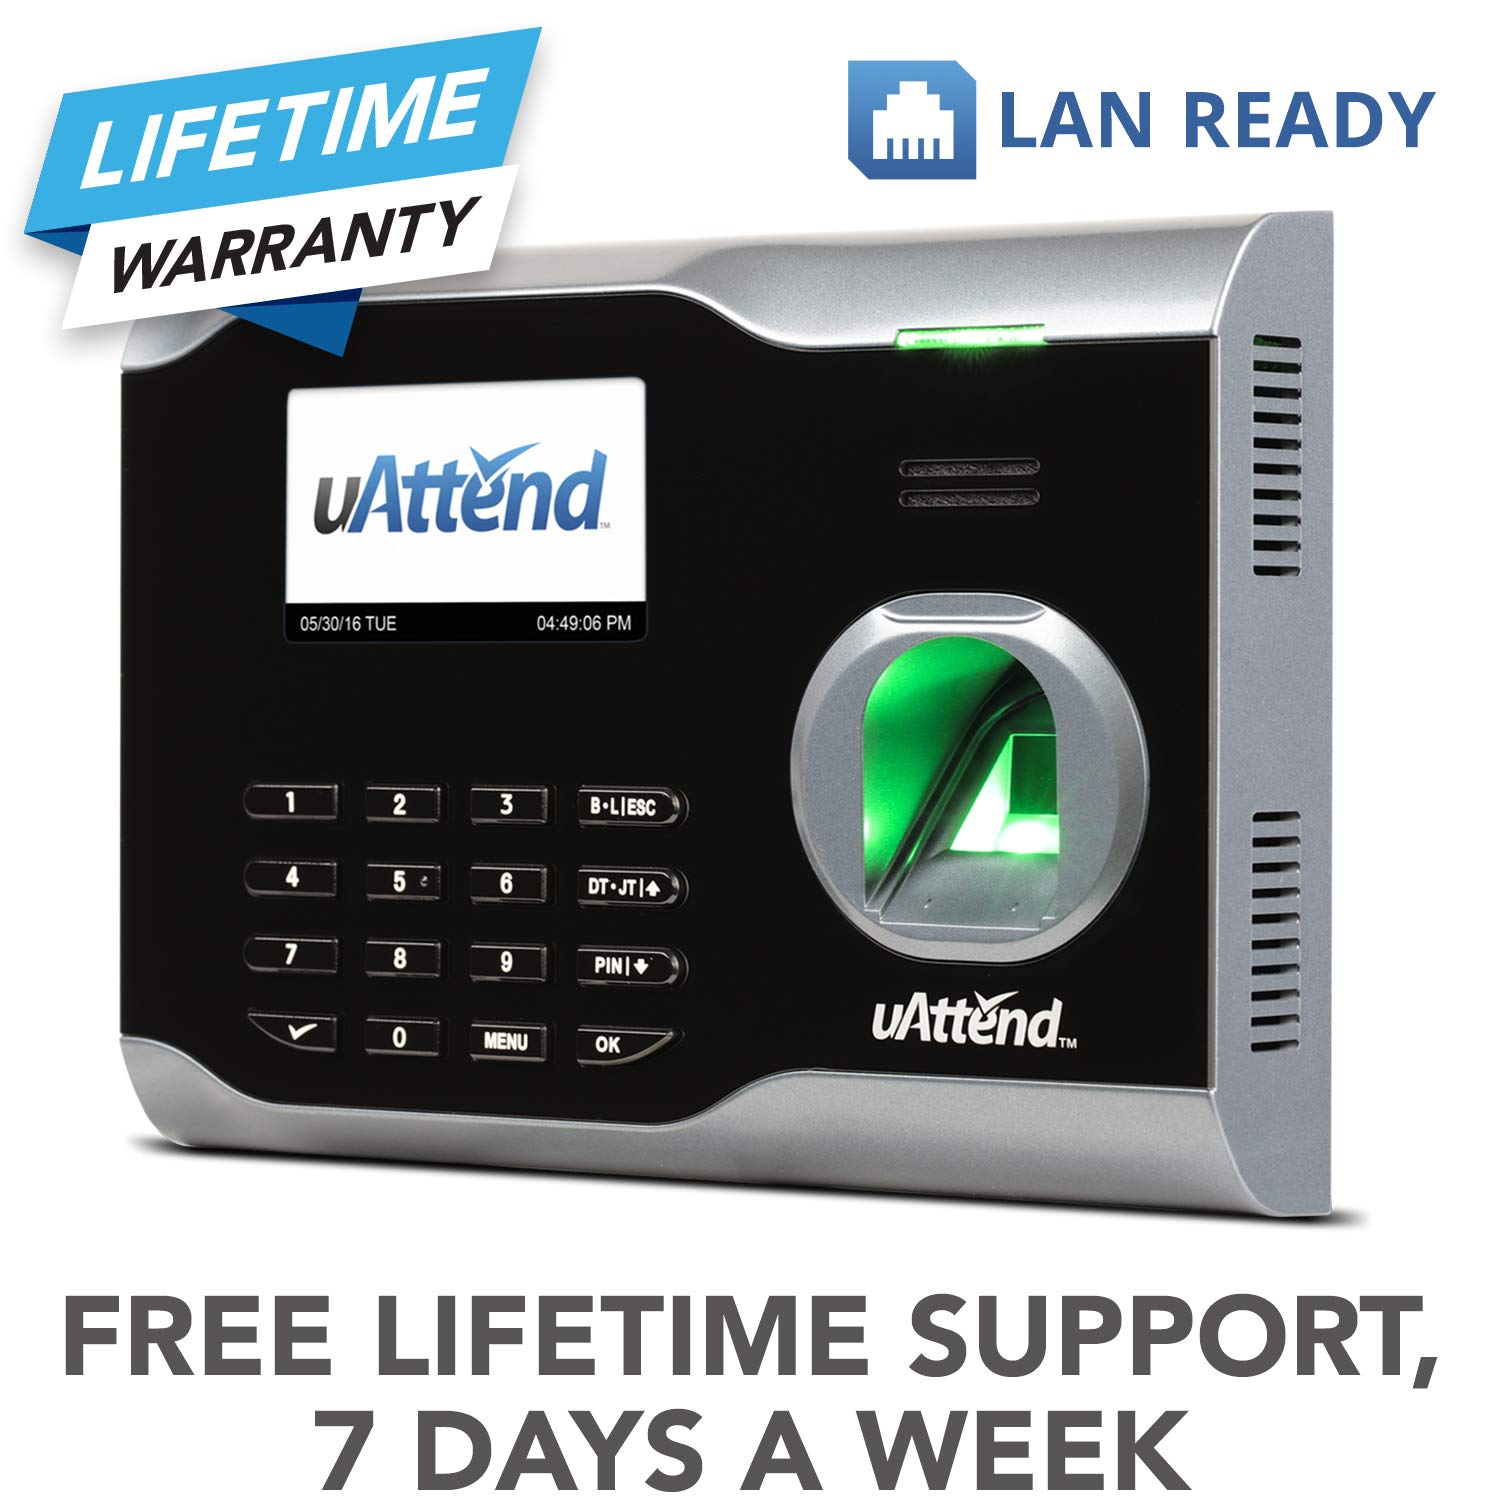 uAttend BN6000 Biometric Fingerprint Time Clock by uAttend